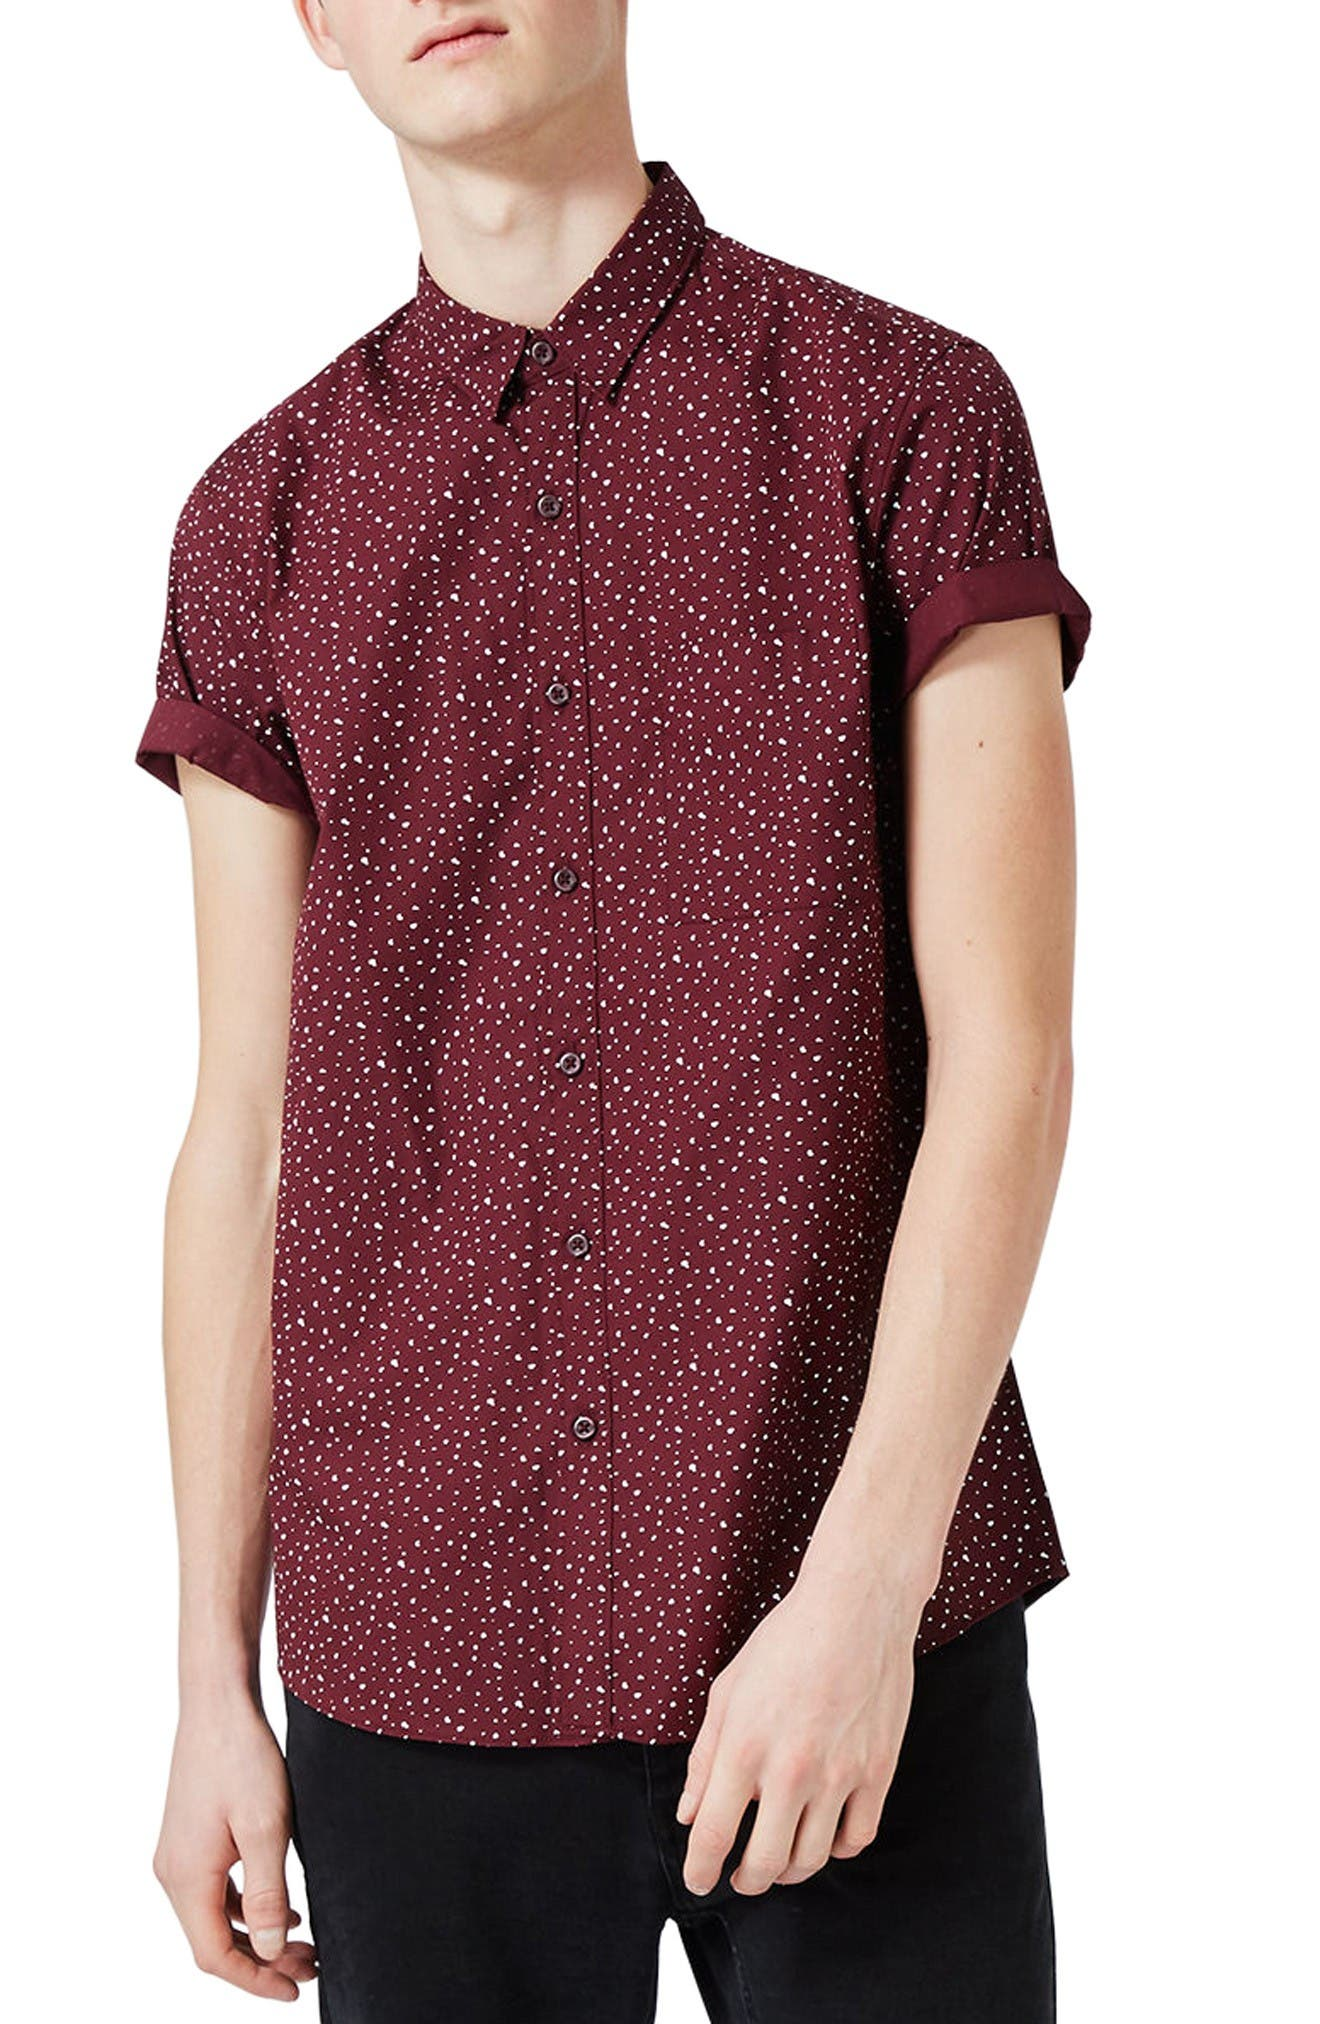 Topman Splotch Print Shirt